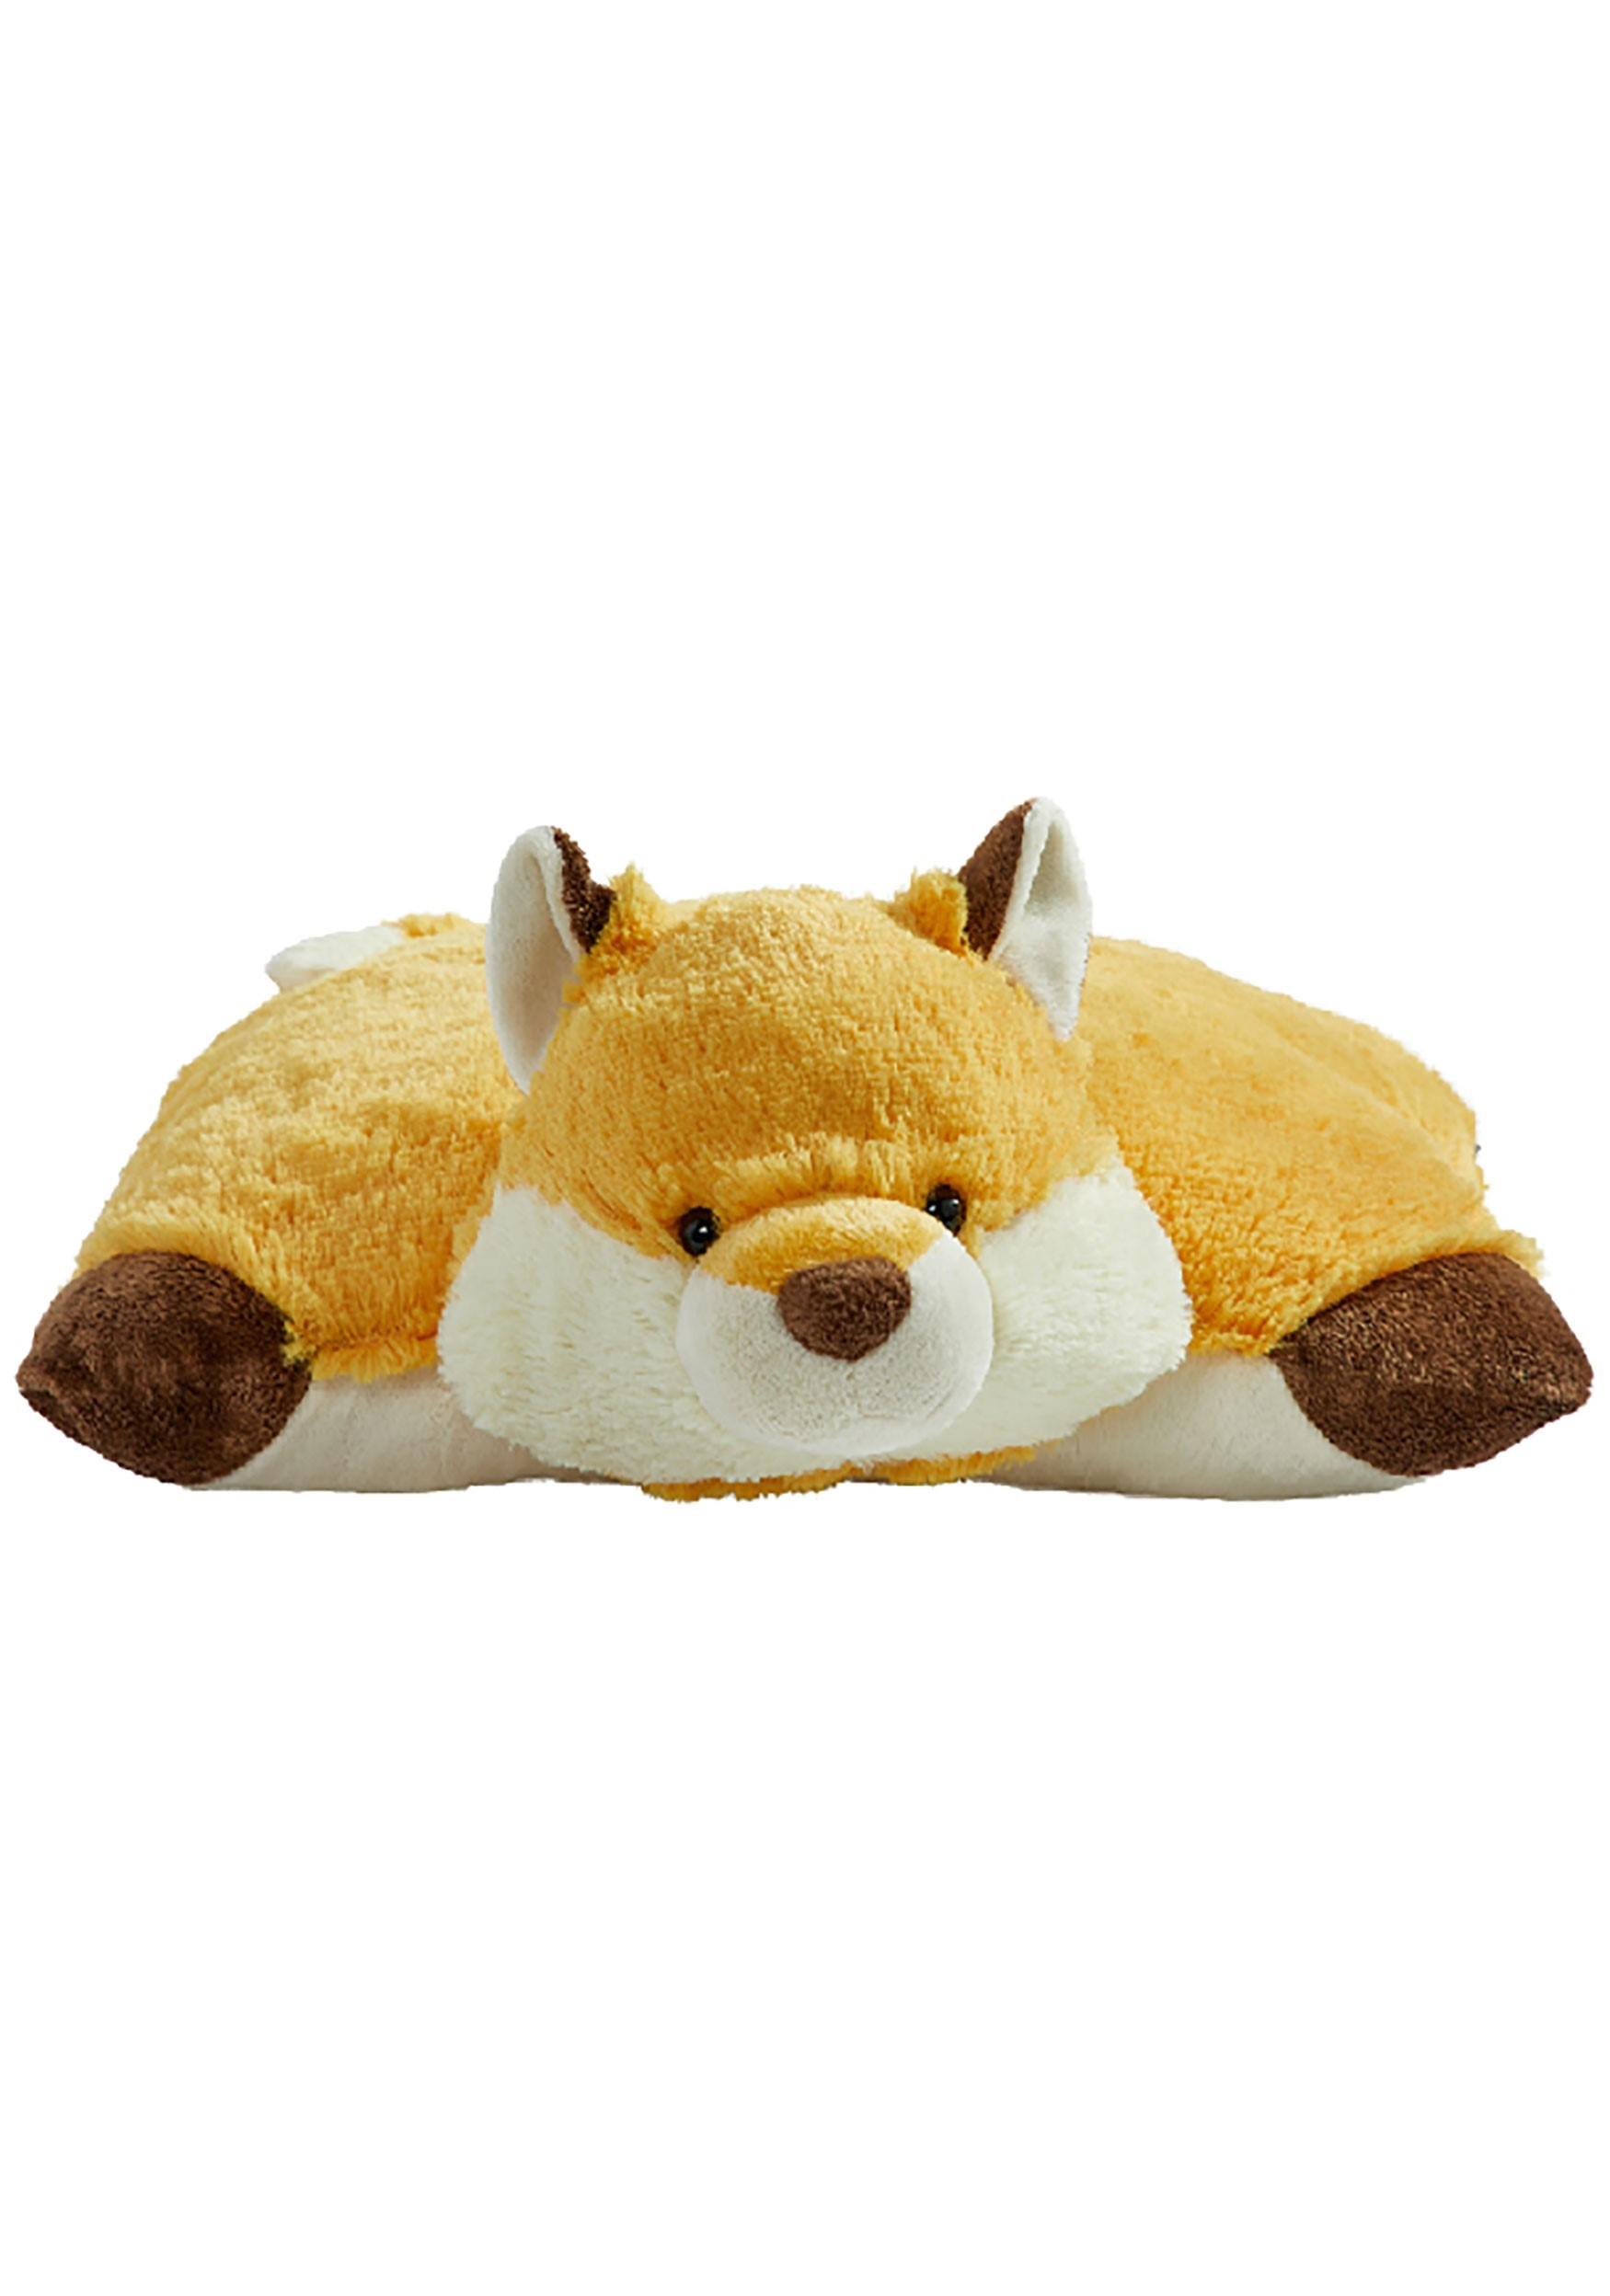 Wild Fox Pillow Pets Plush